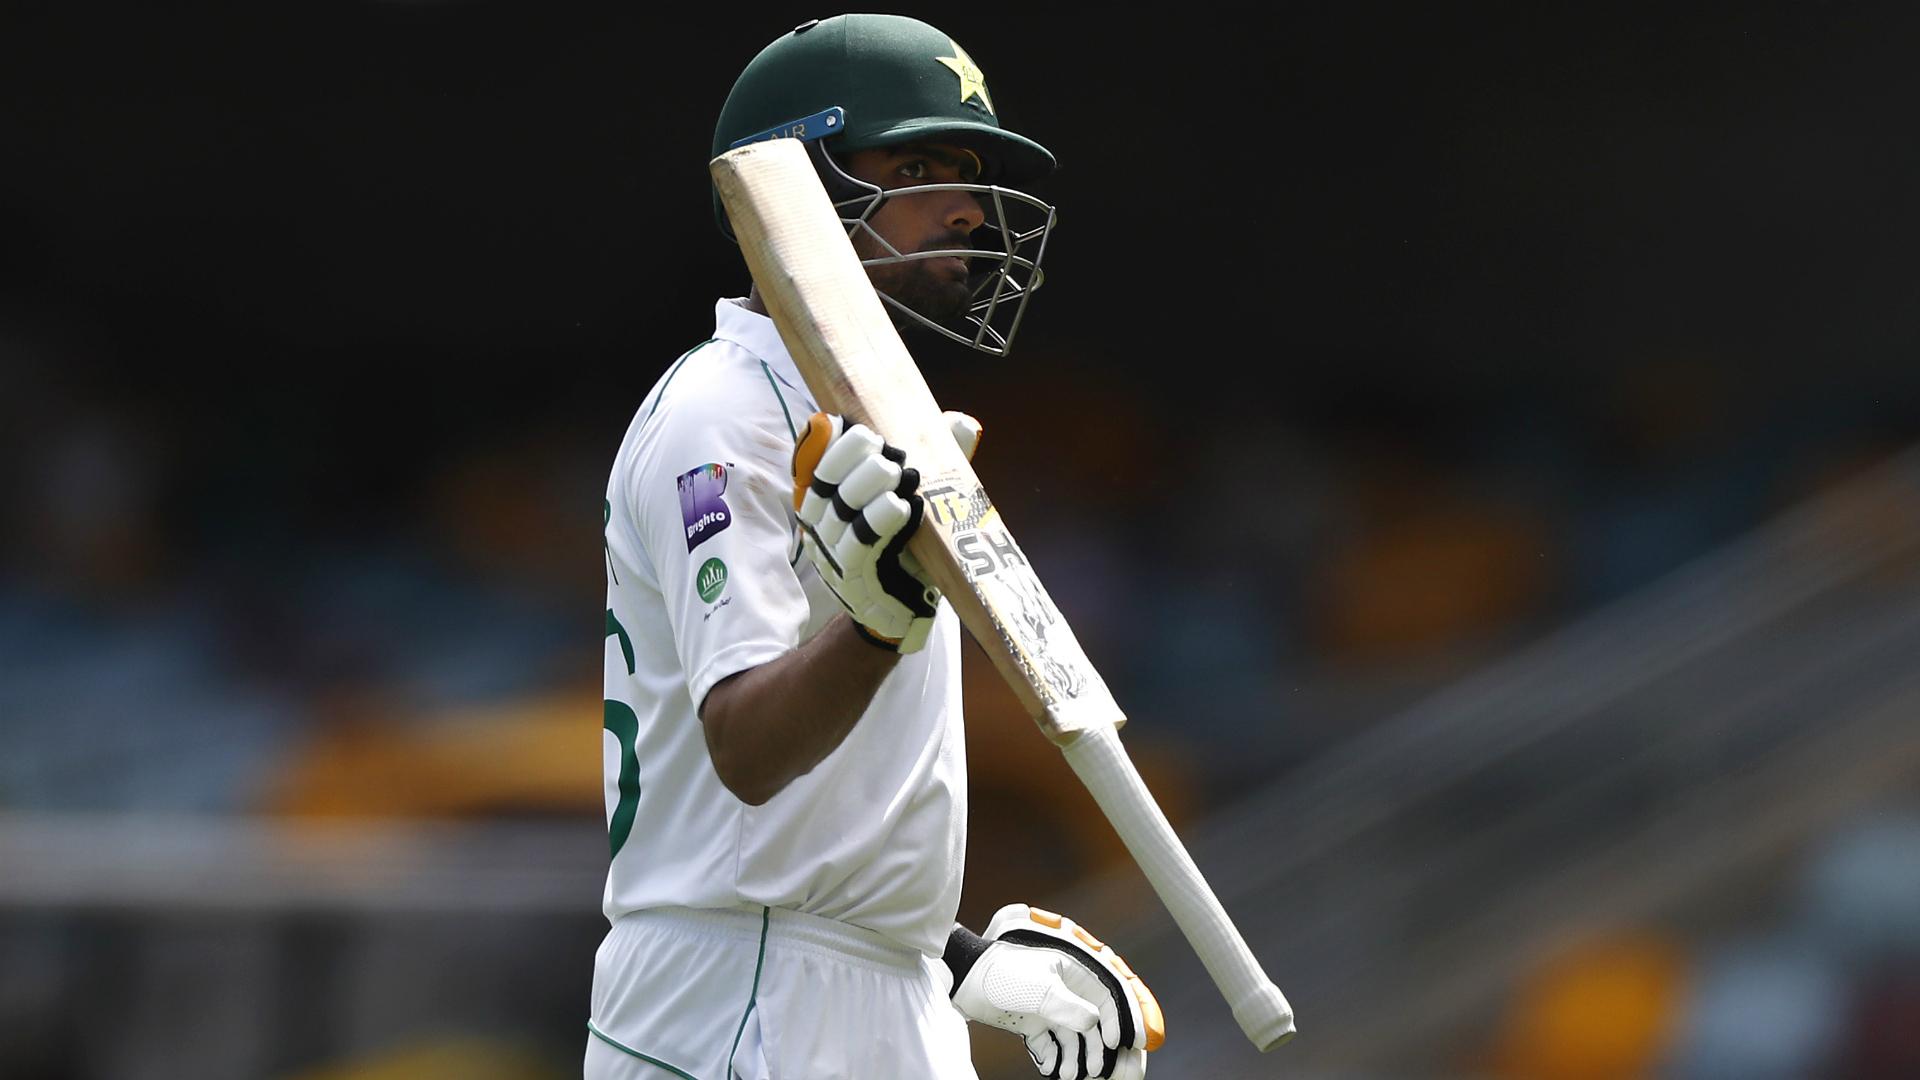 Babar Azam runs give Pakistan huge positive from defeats, says Azhar Ali